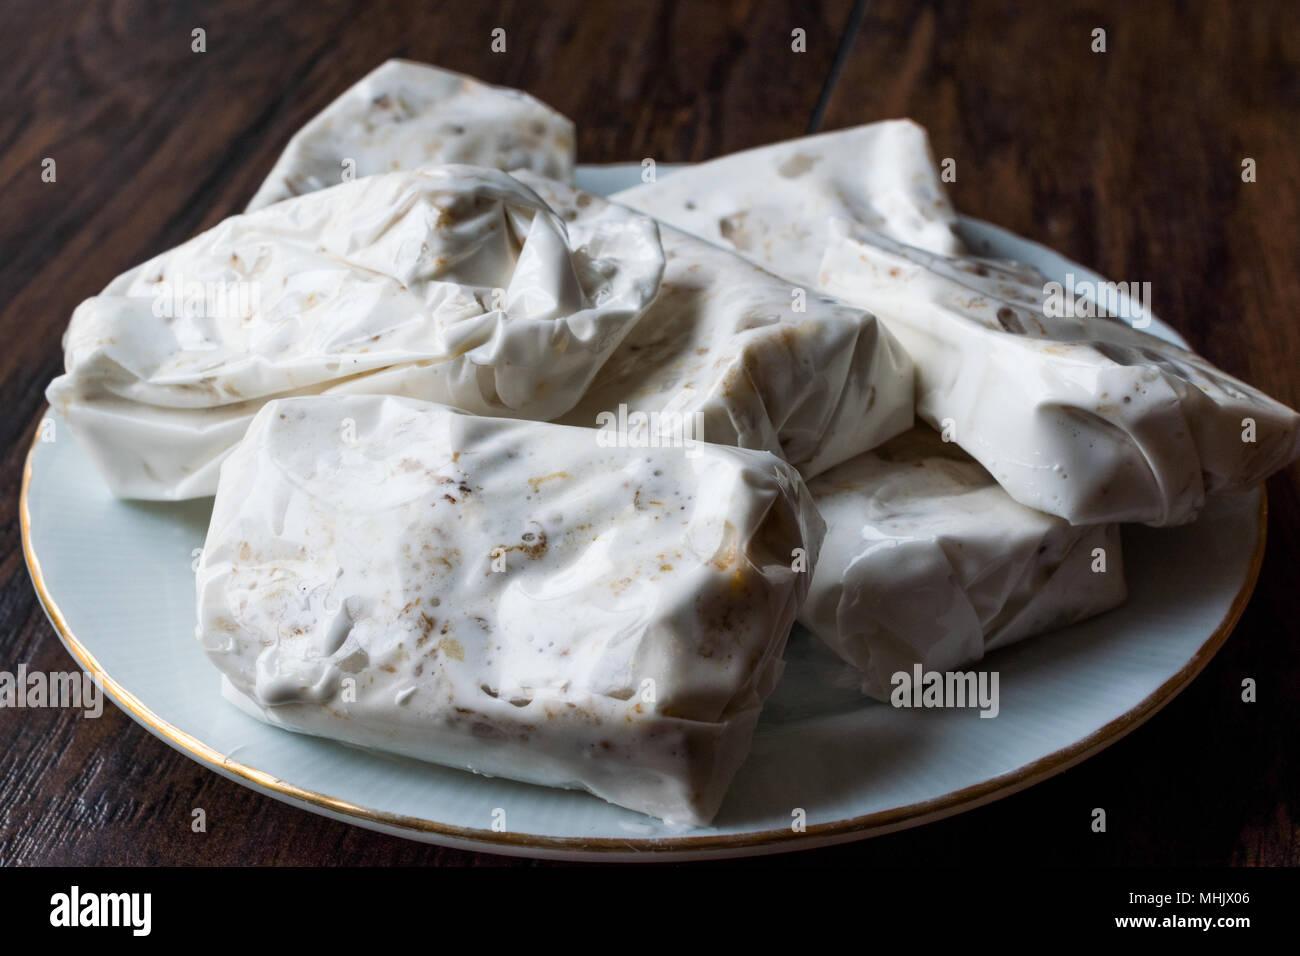 Turkish Helva Sakiz Helvasi / Gum Halva with Walnut. Traditional Food. - Stock Image